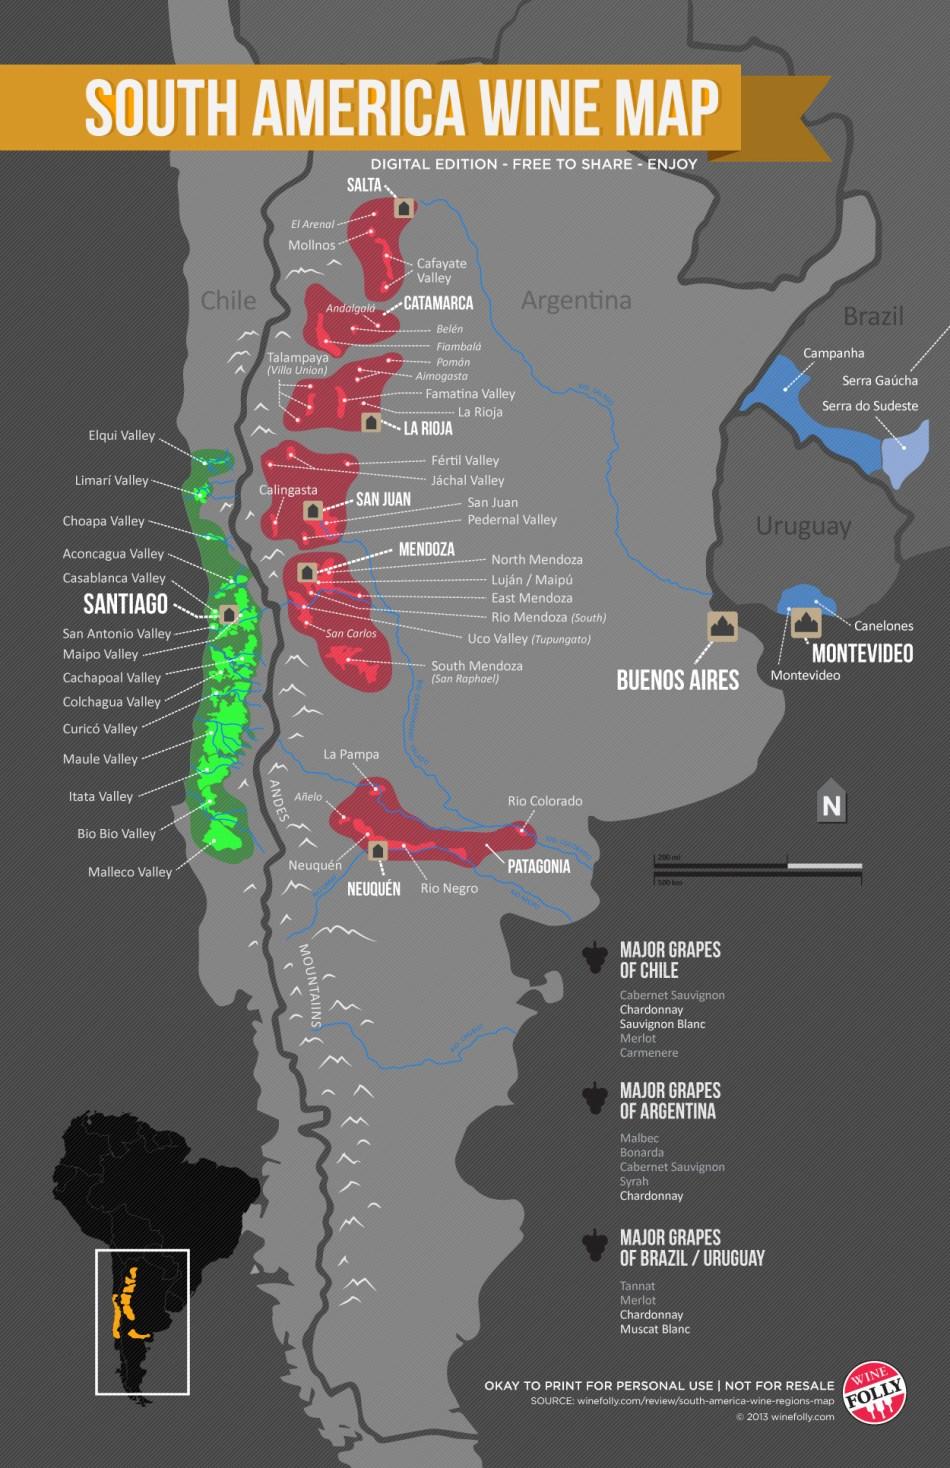 South-America-Wine-Map-wine-folly.jpg